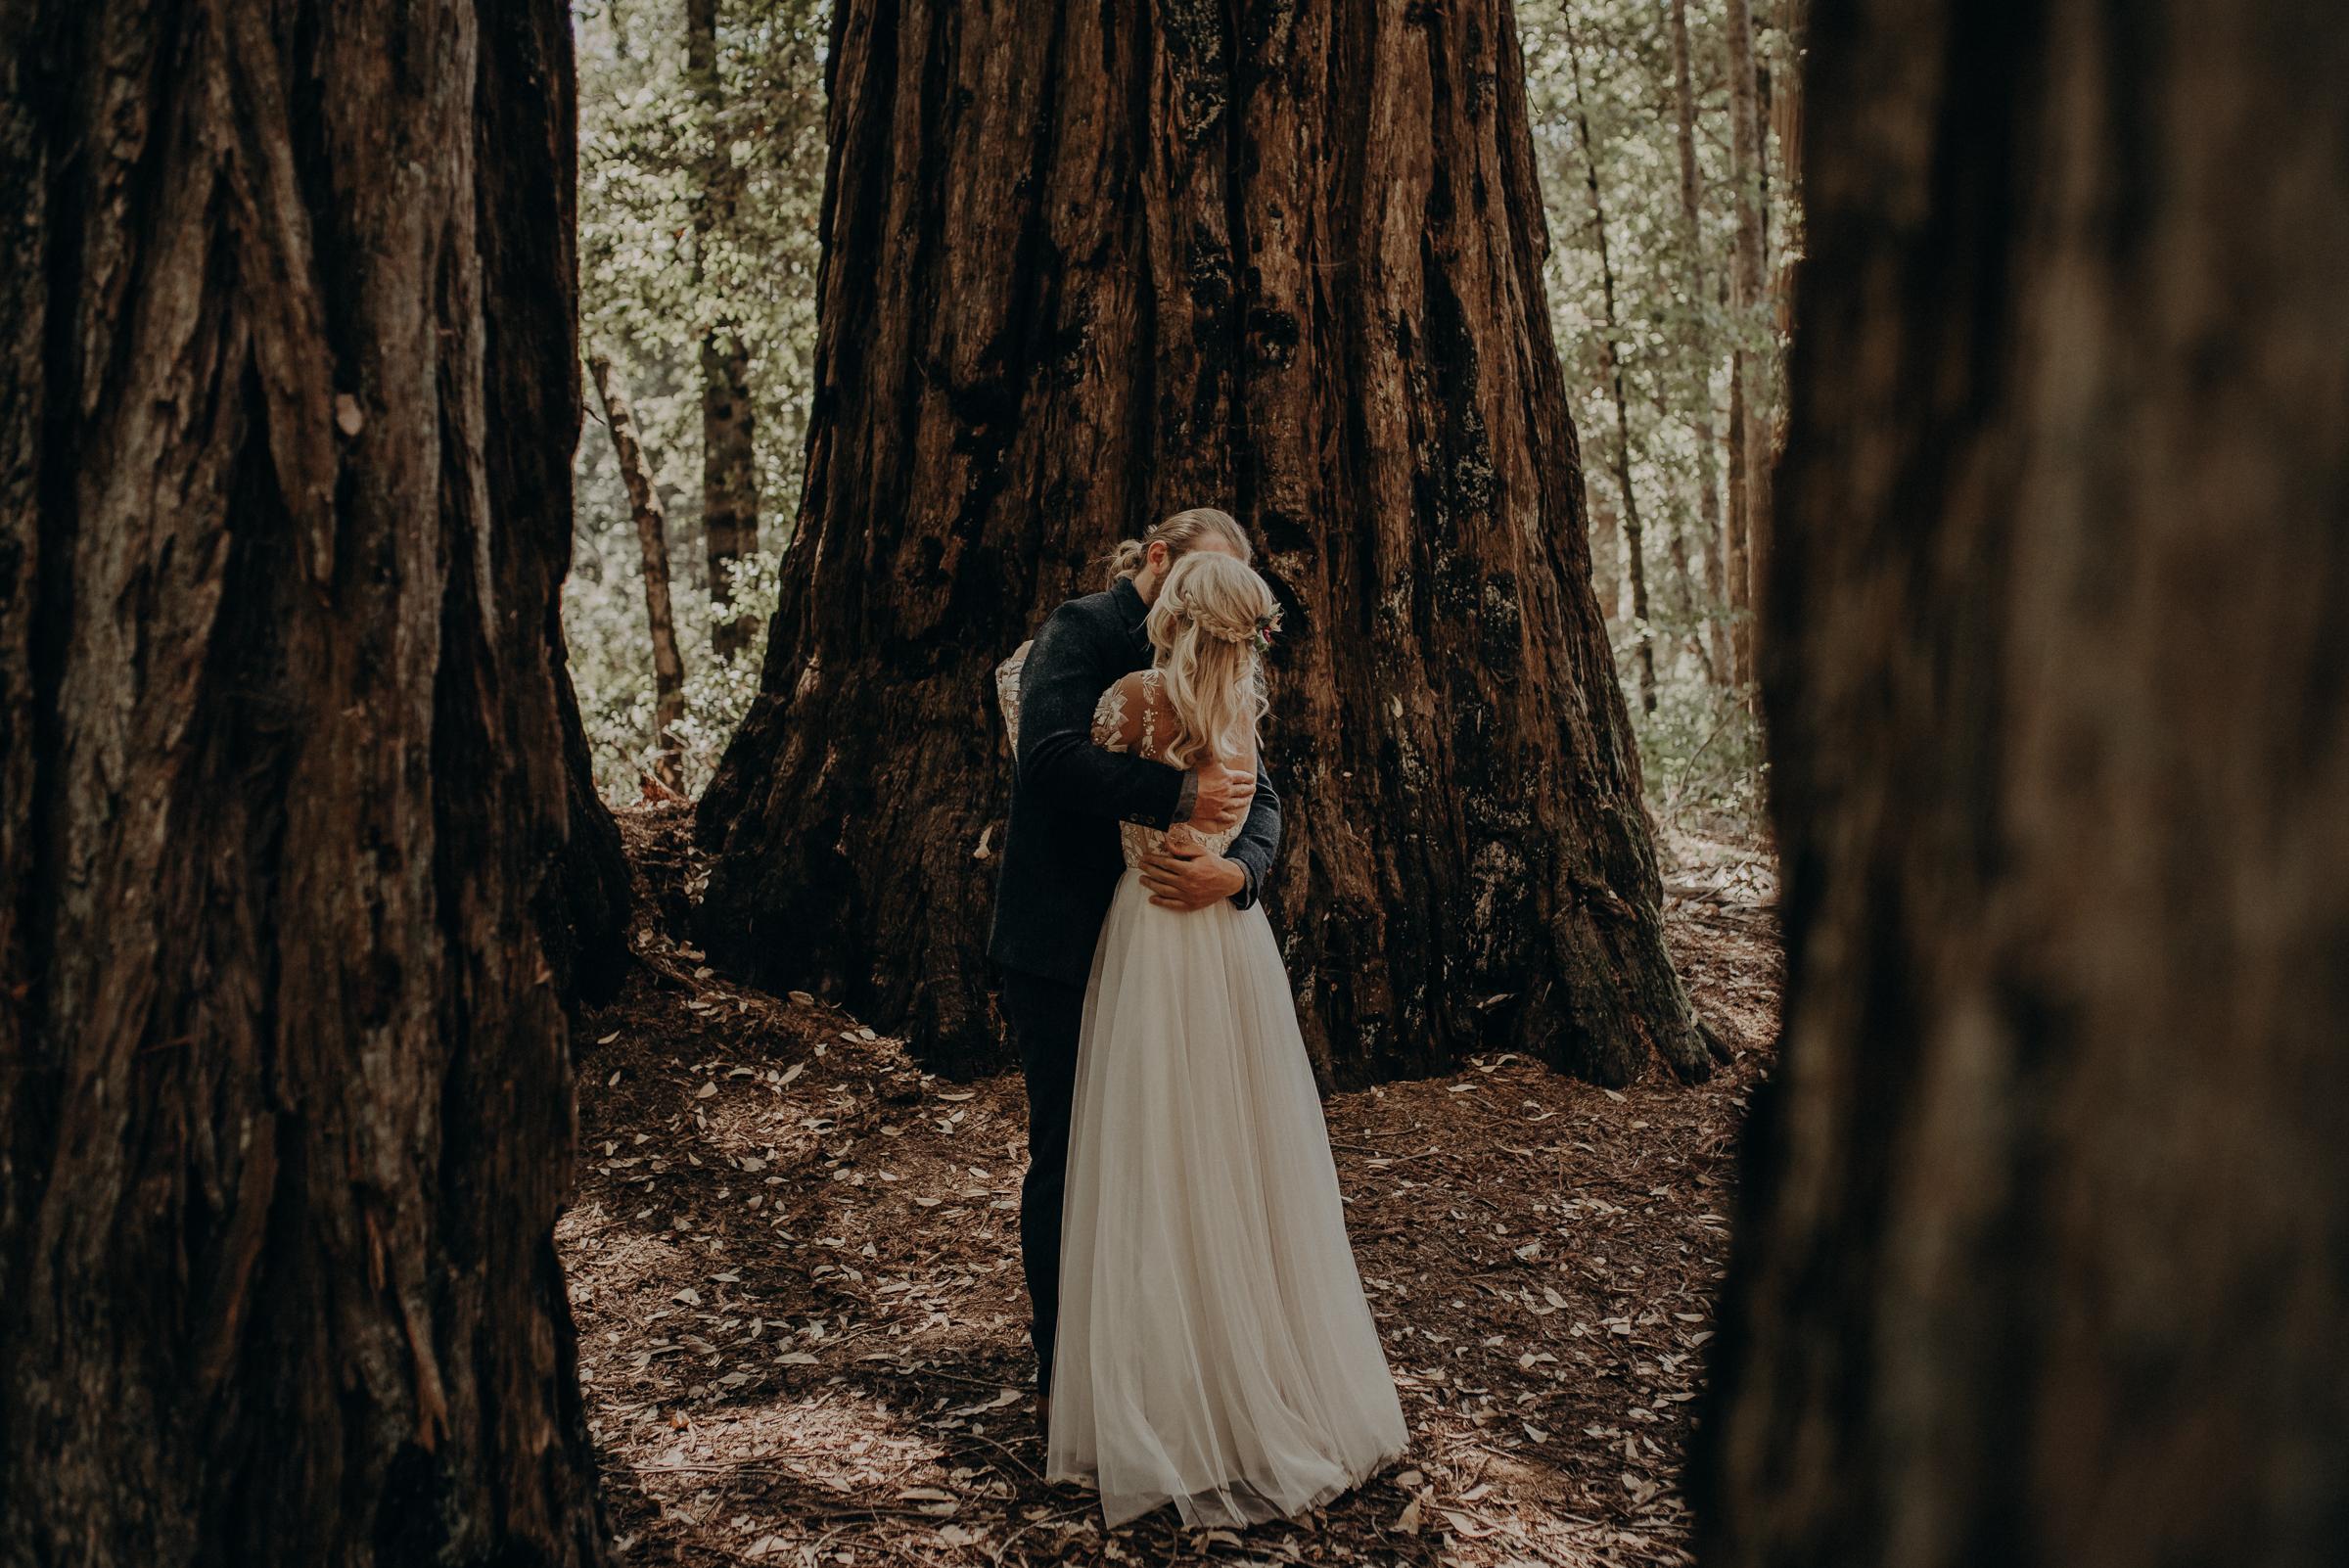 IsaiahAndTaylor.com - California Destination Elopement, Lake Leonard Reserve Wedding, Ukiah-056.jpg